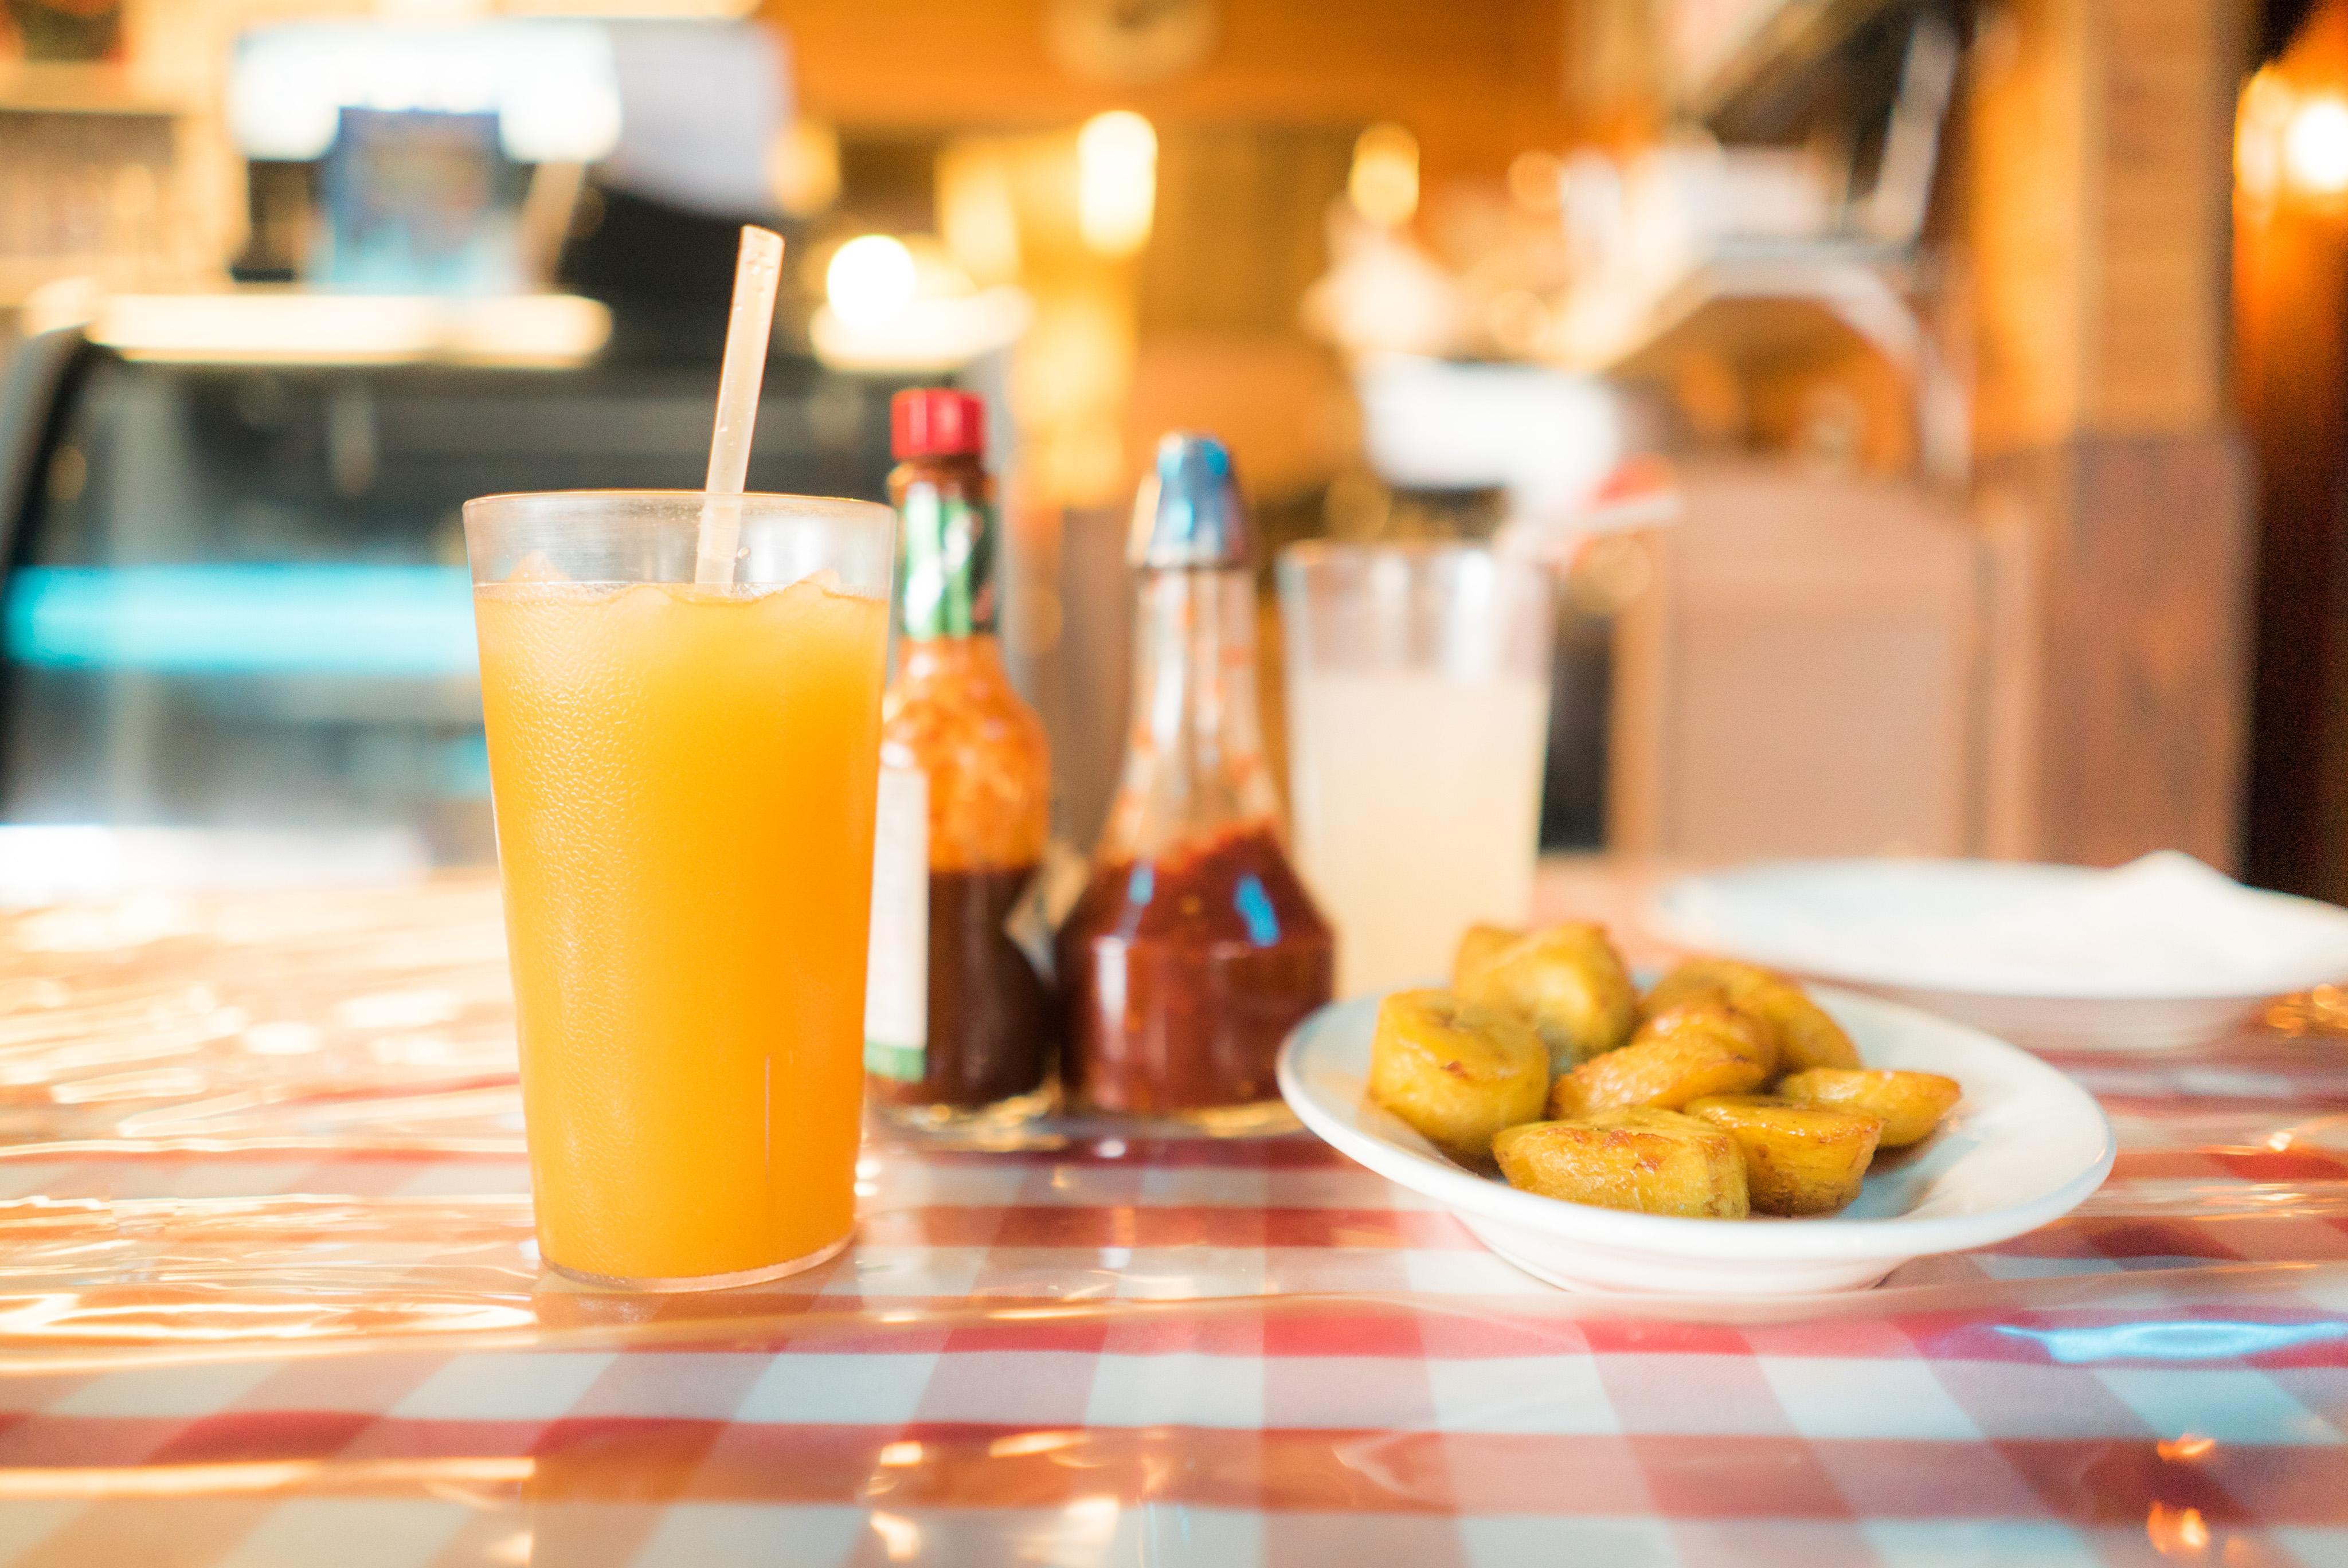 Картинки напитки для завтрака, днем